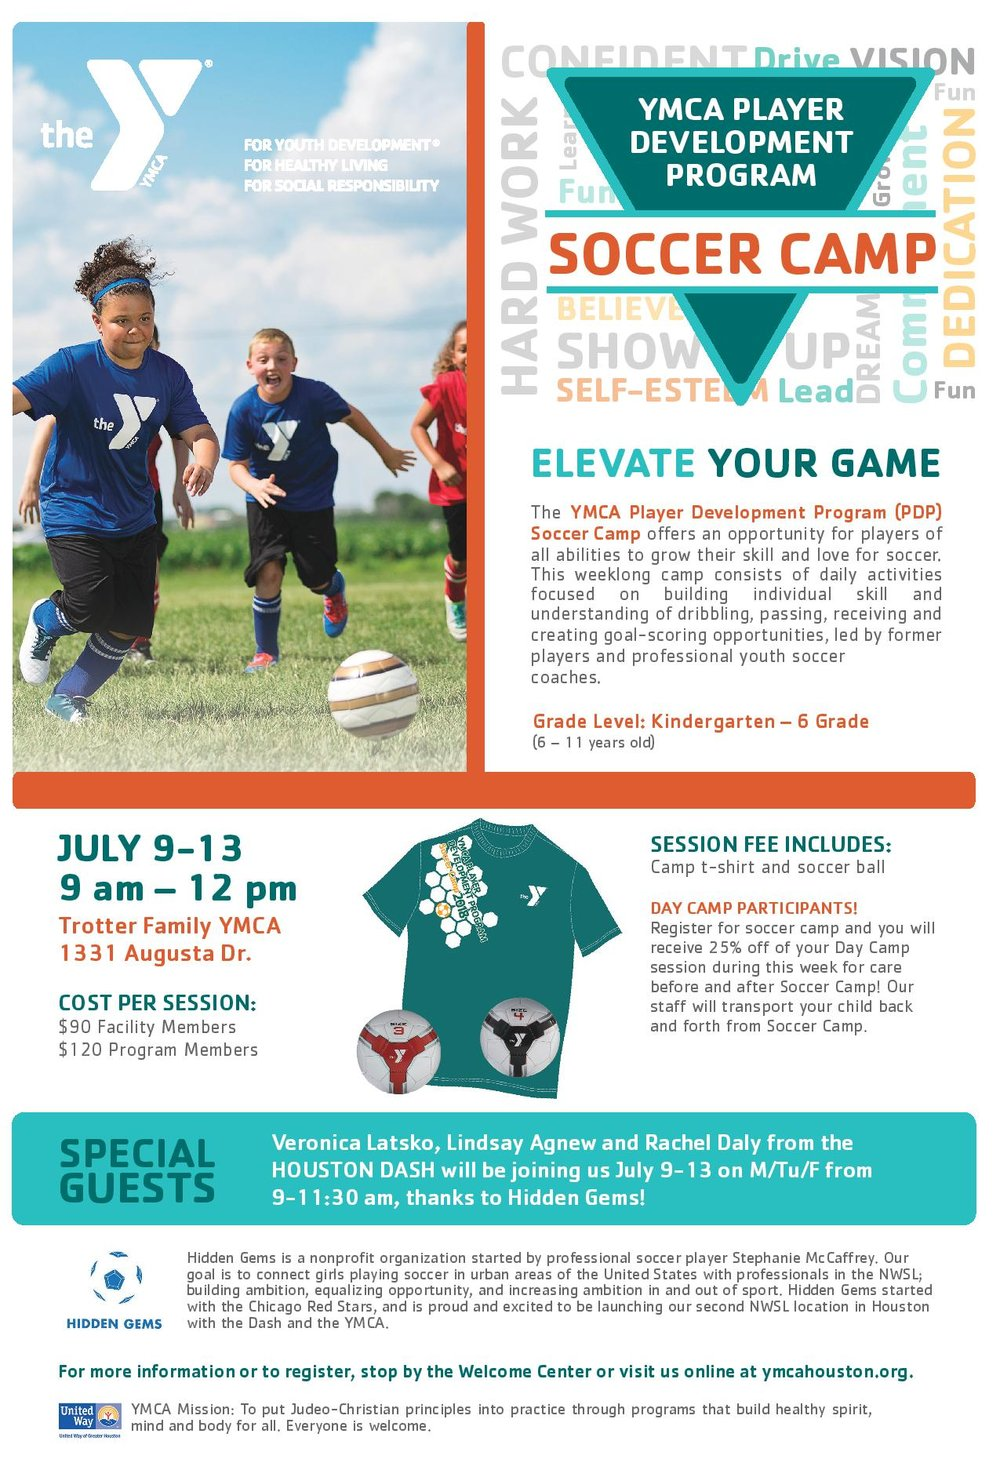 Marketing Flyer for Hidden Gems/ YMCA summer camp collaboration